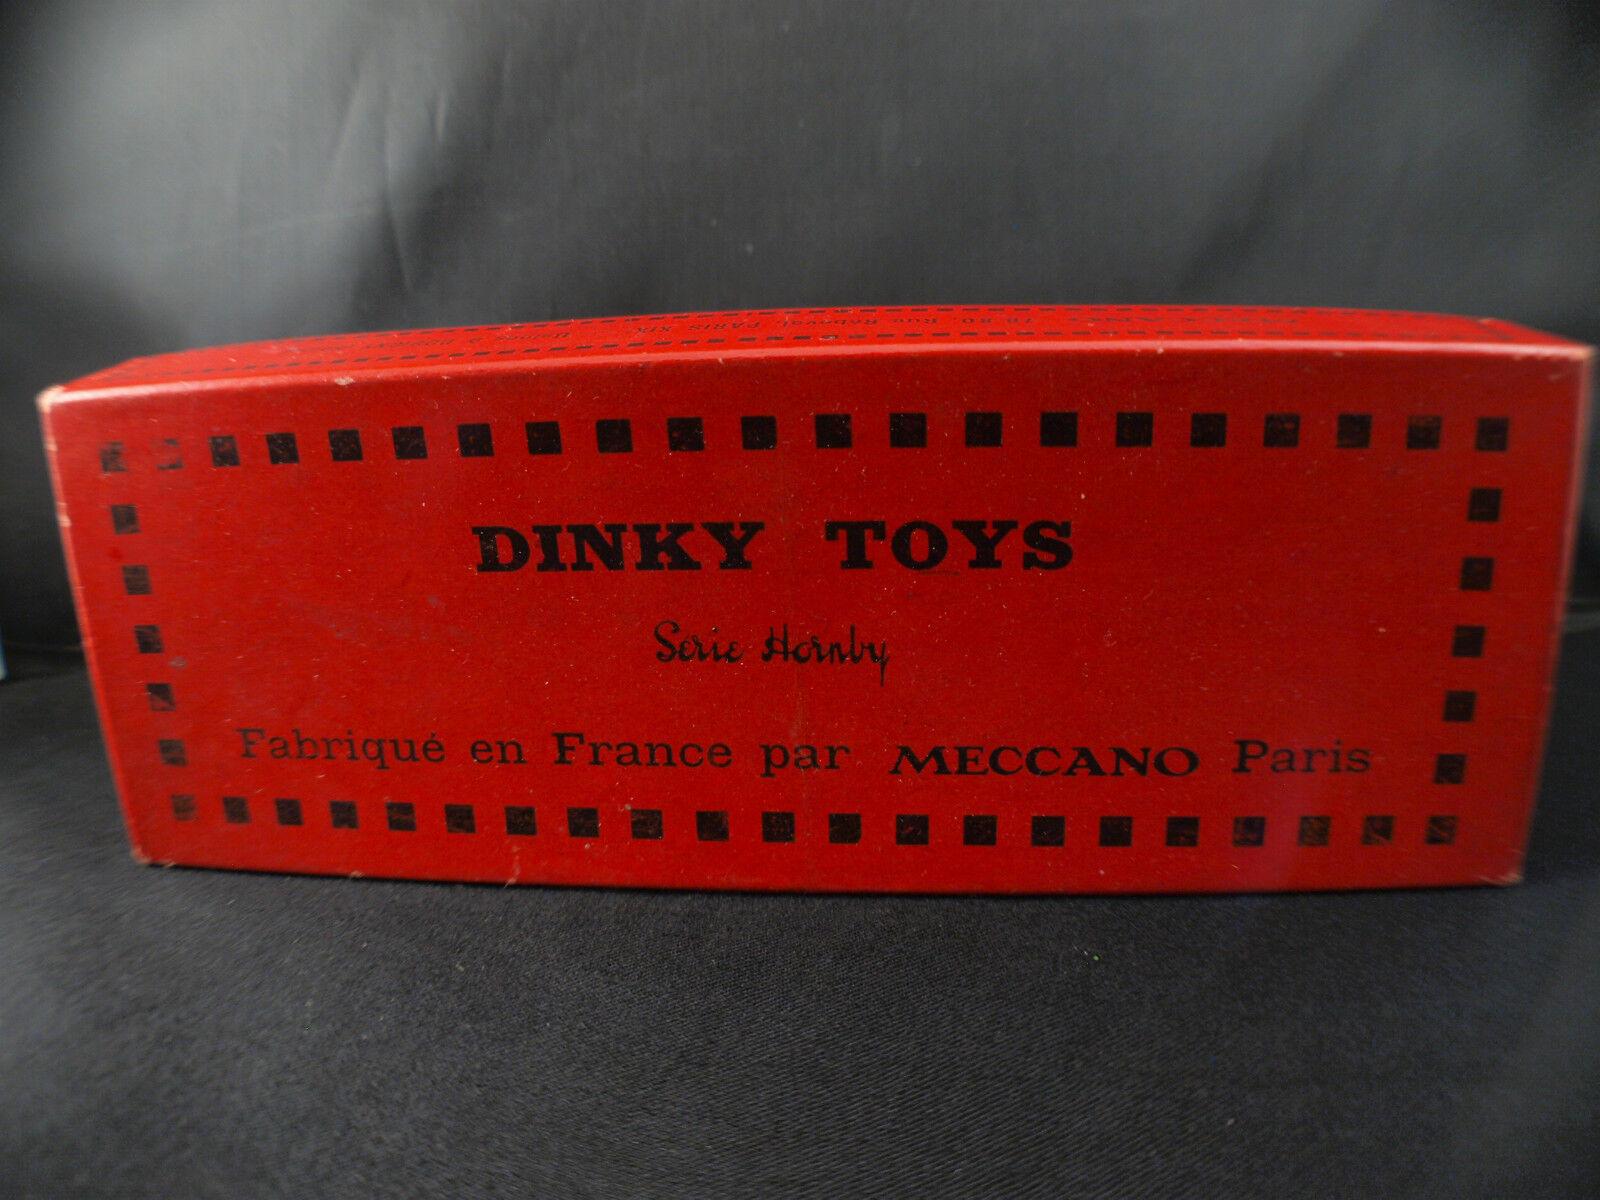 Bolte seule dinky spielzeug f n ° 4 chemin de fer beschäftigen é s de s é rie hornby - box nur